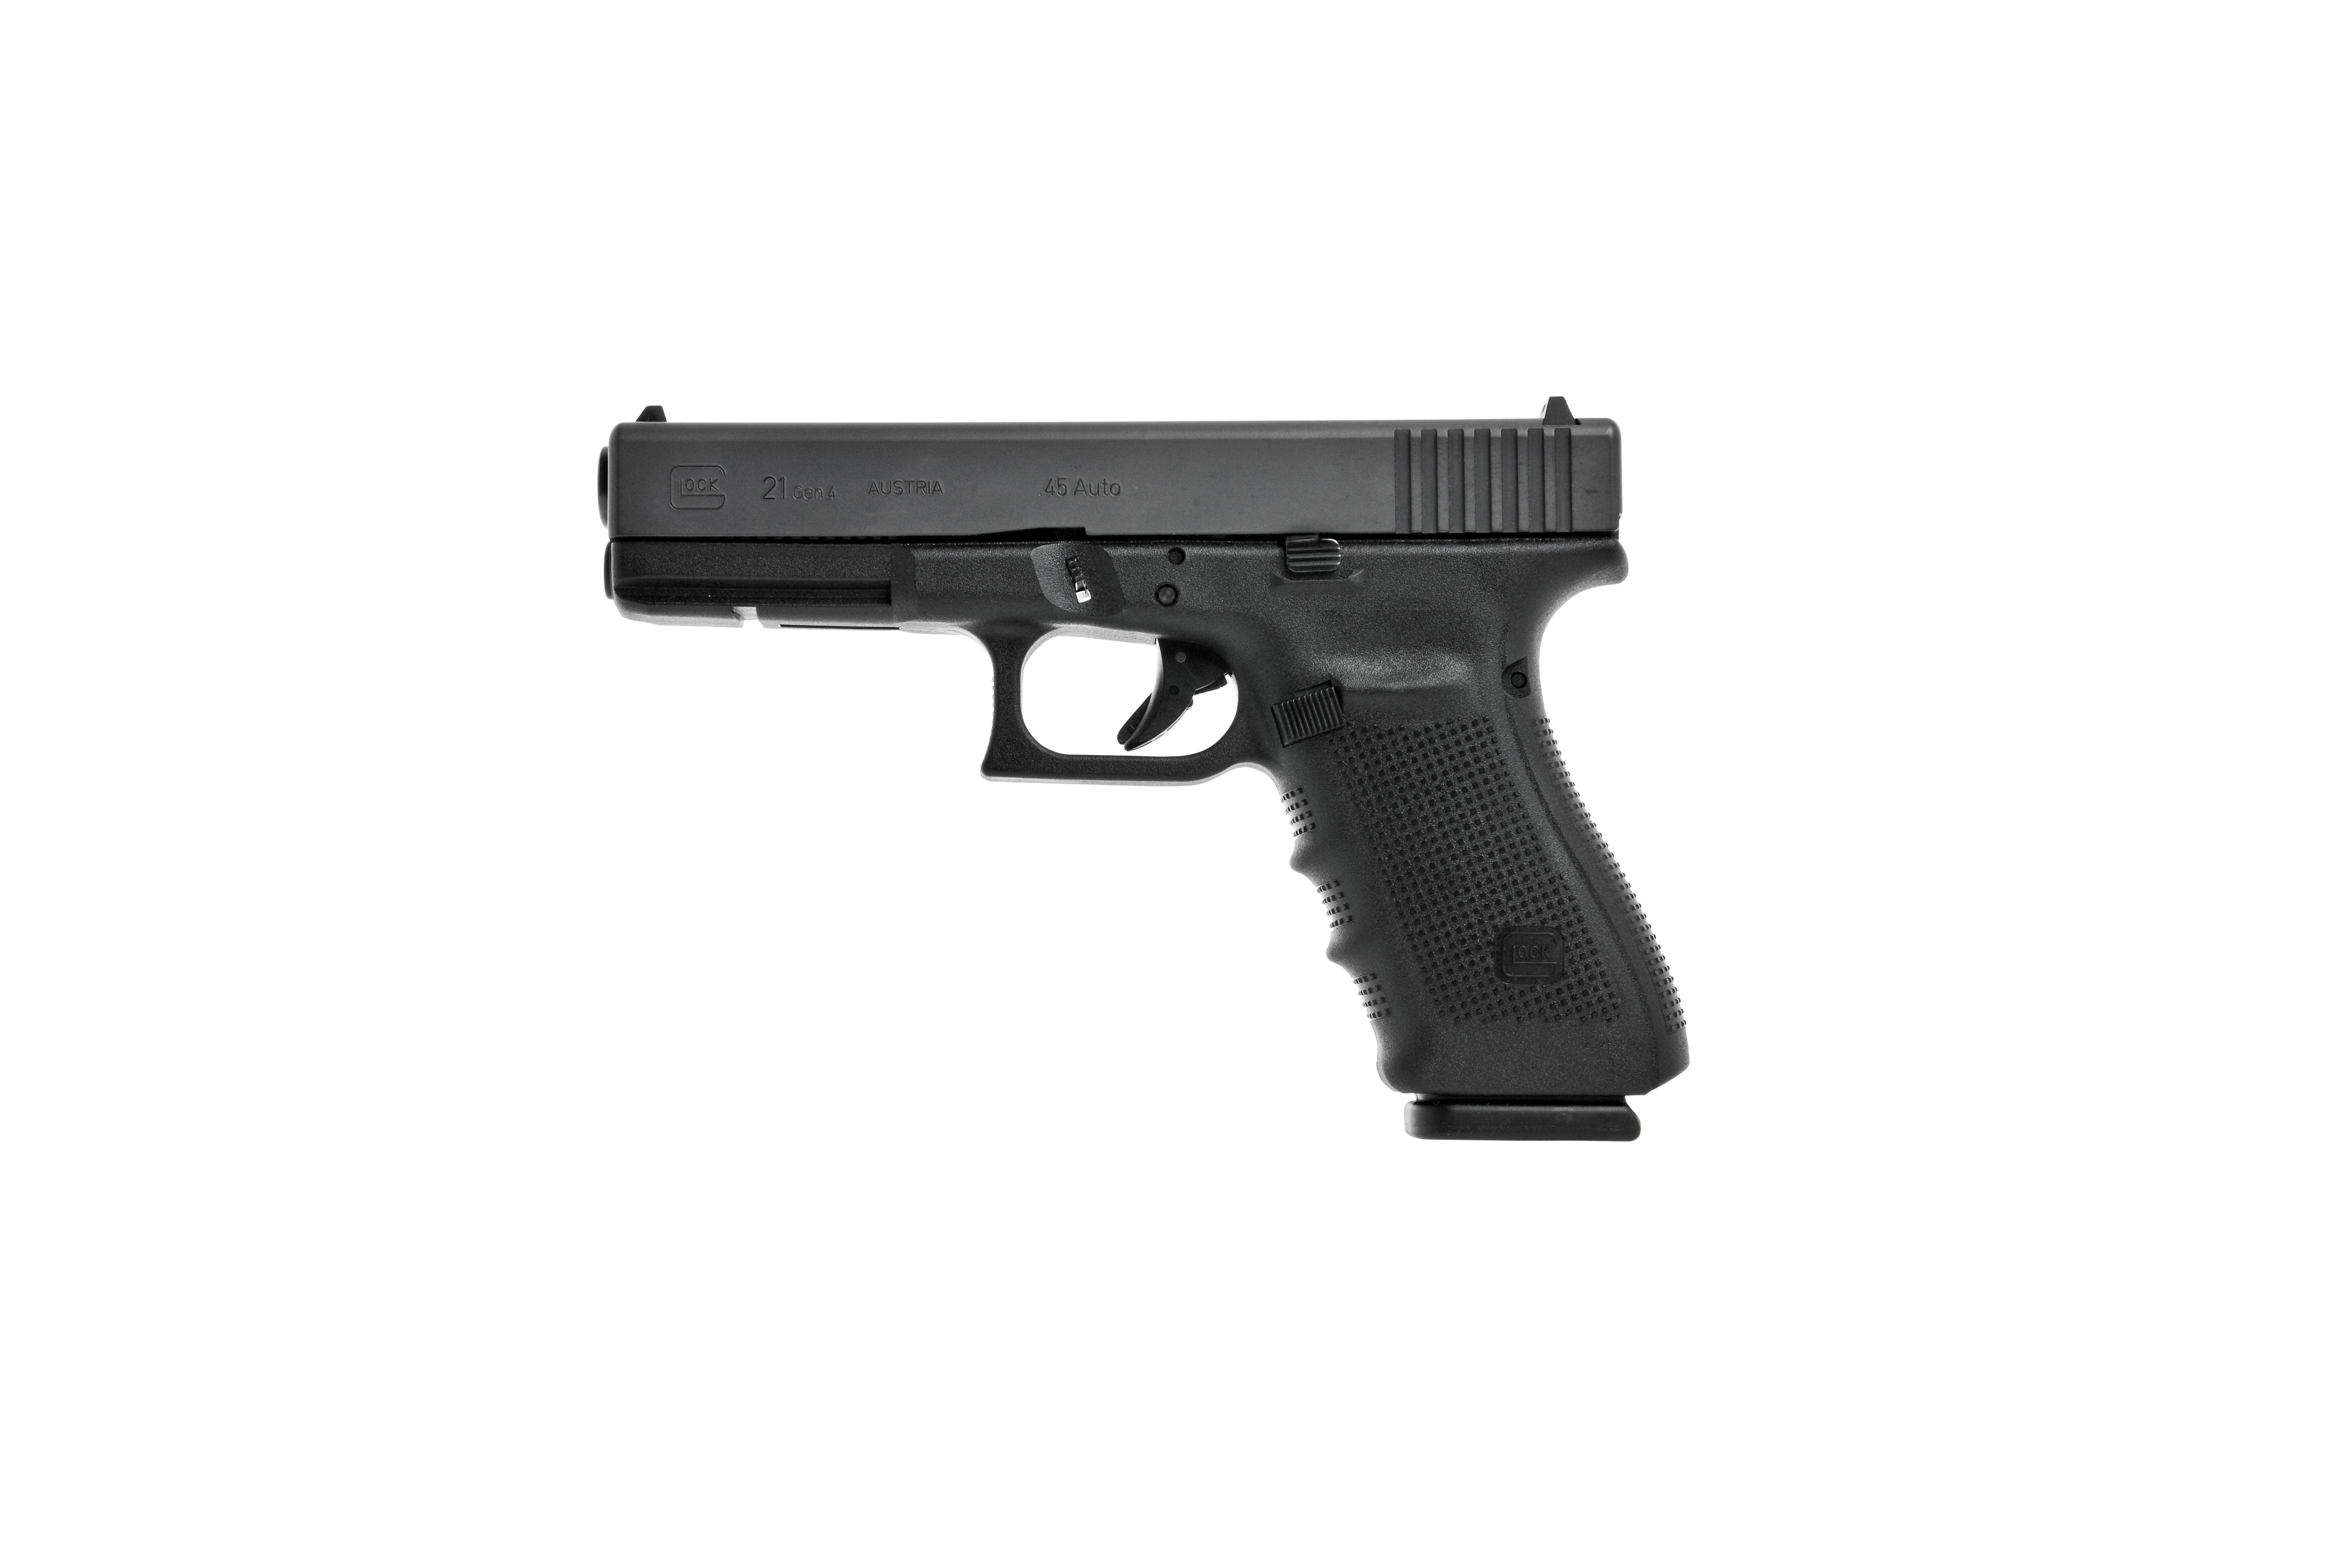 GLOCK Handgun G21 Gen4